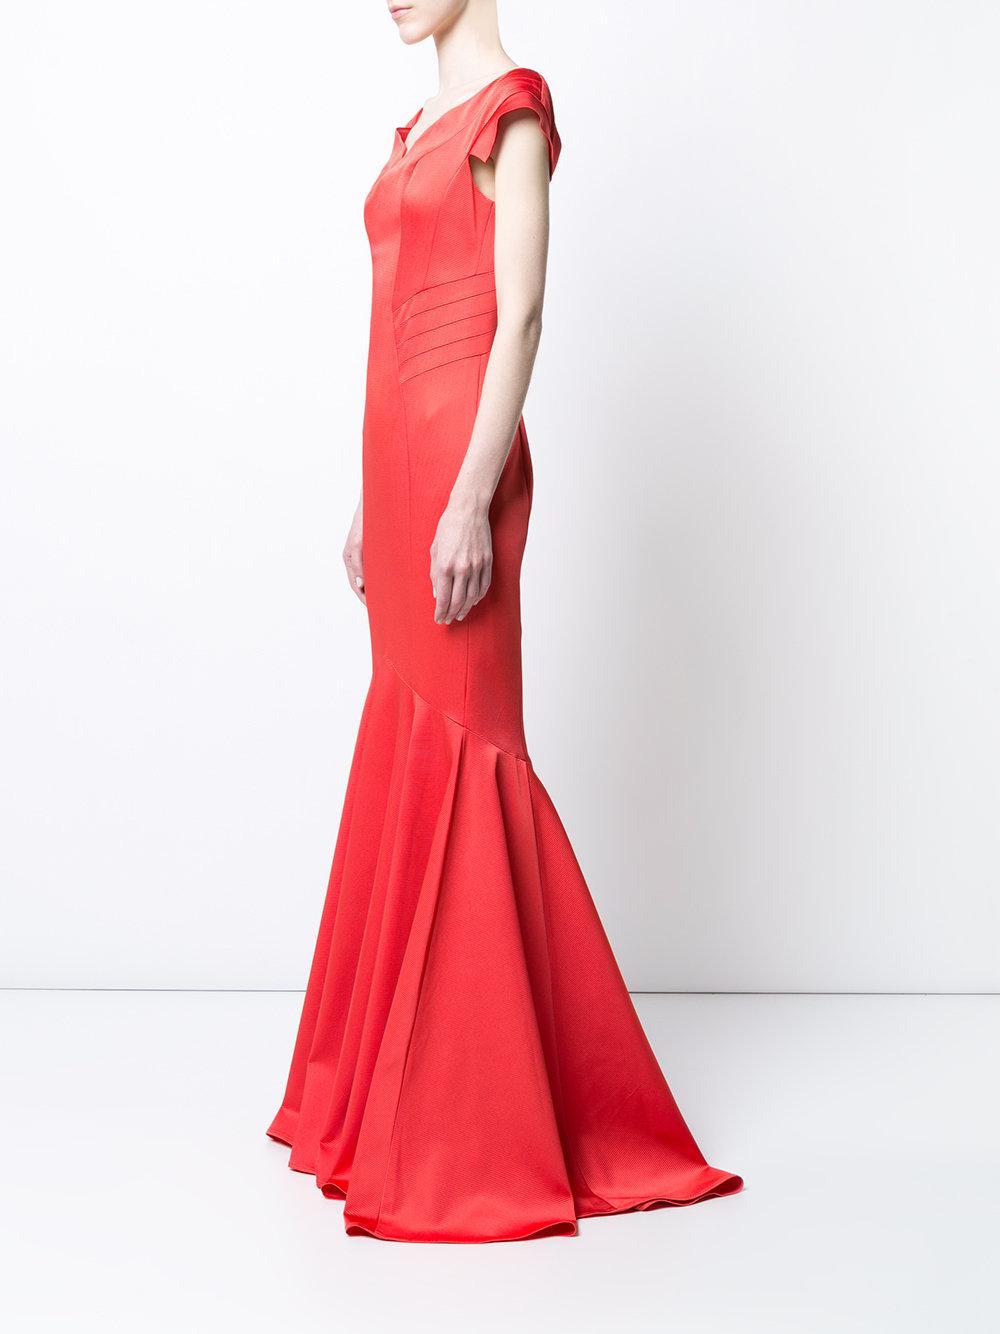 Low Shipping Fee Cheap Price Online Shop Trudy mermaid tail gown - Yellow & Orange Zac Posen 27xCEeb